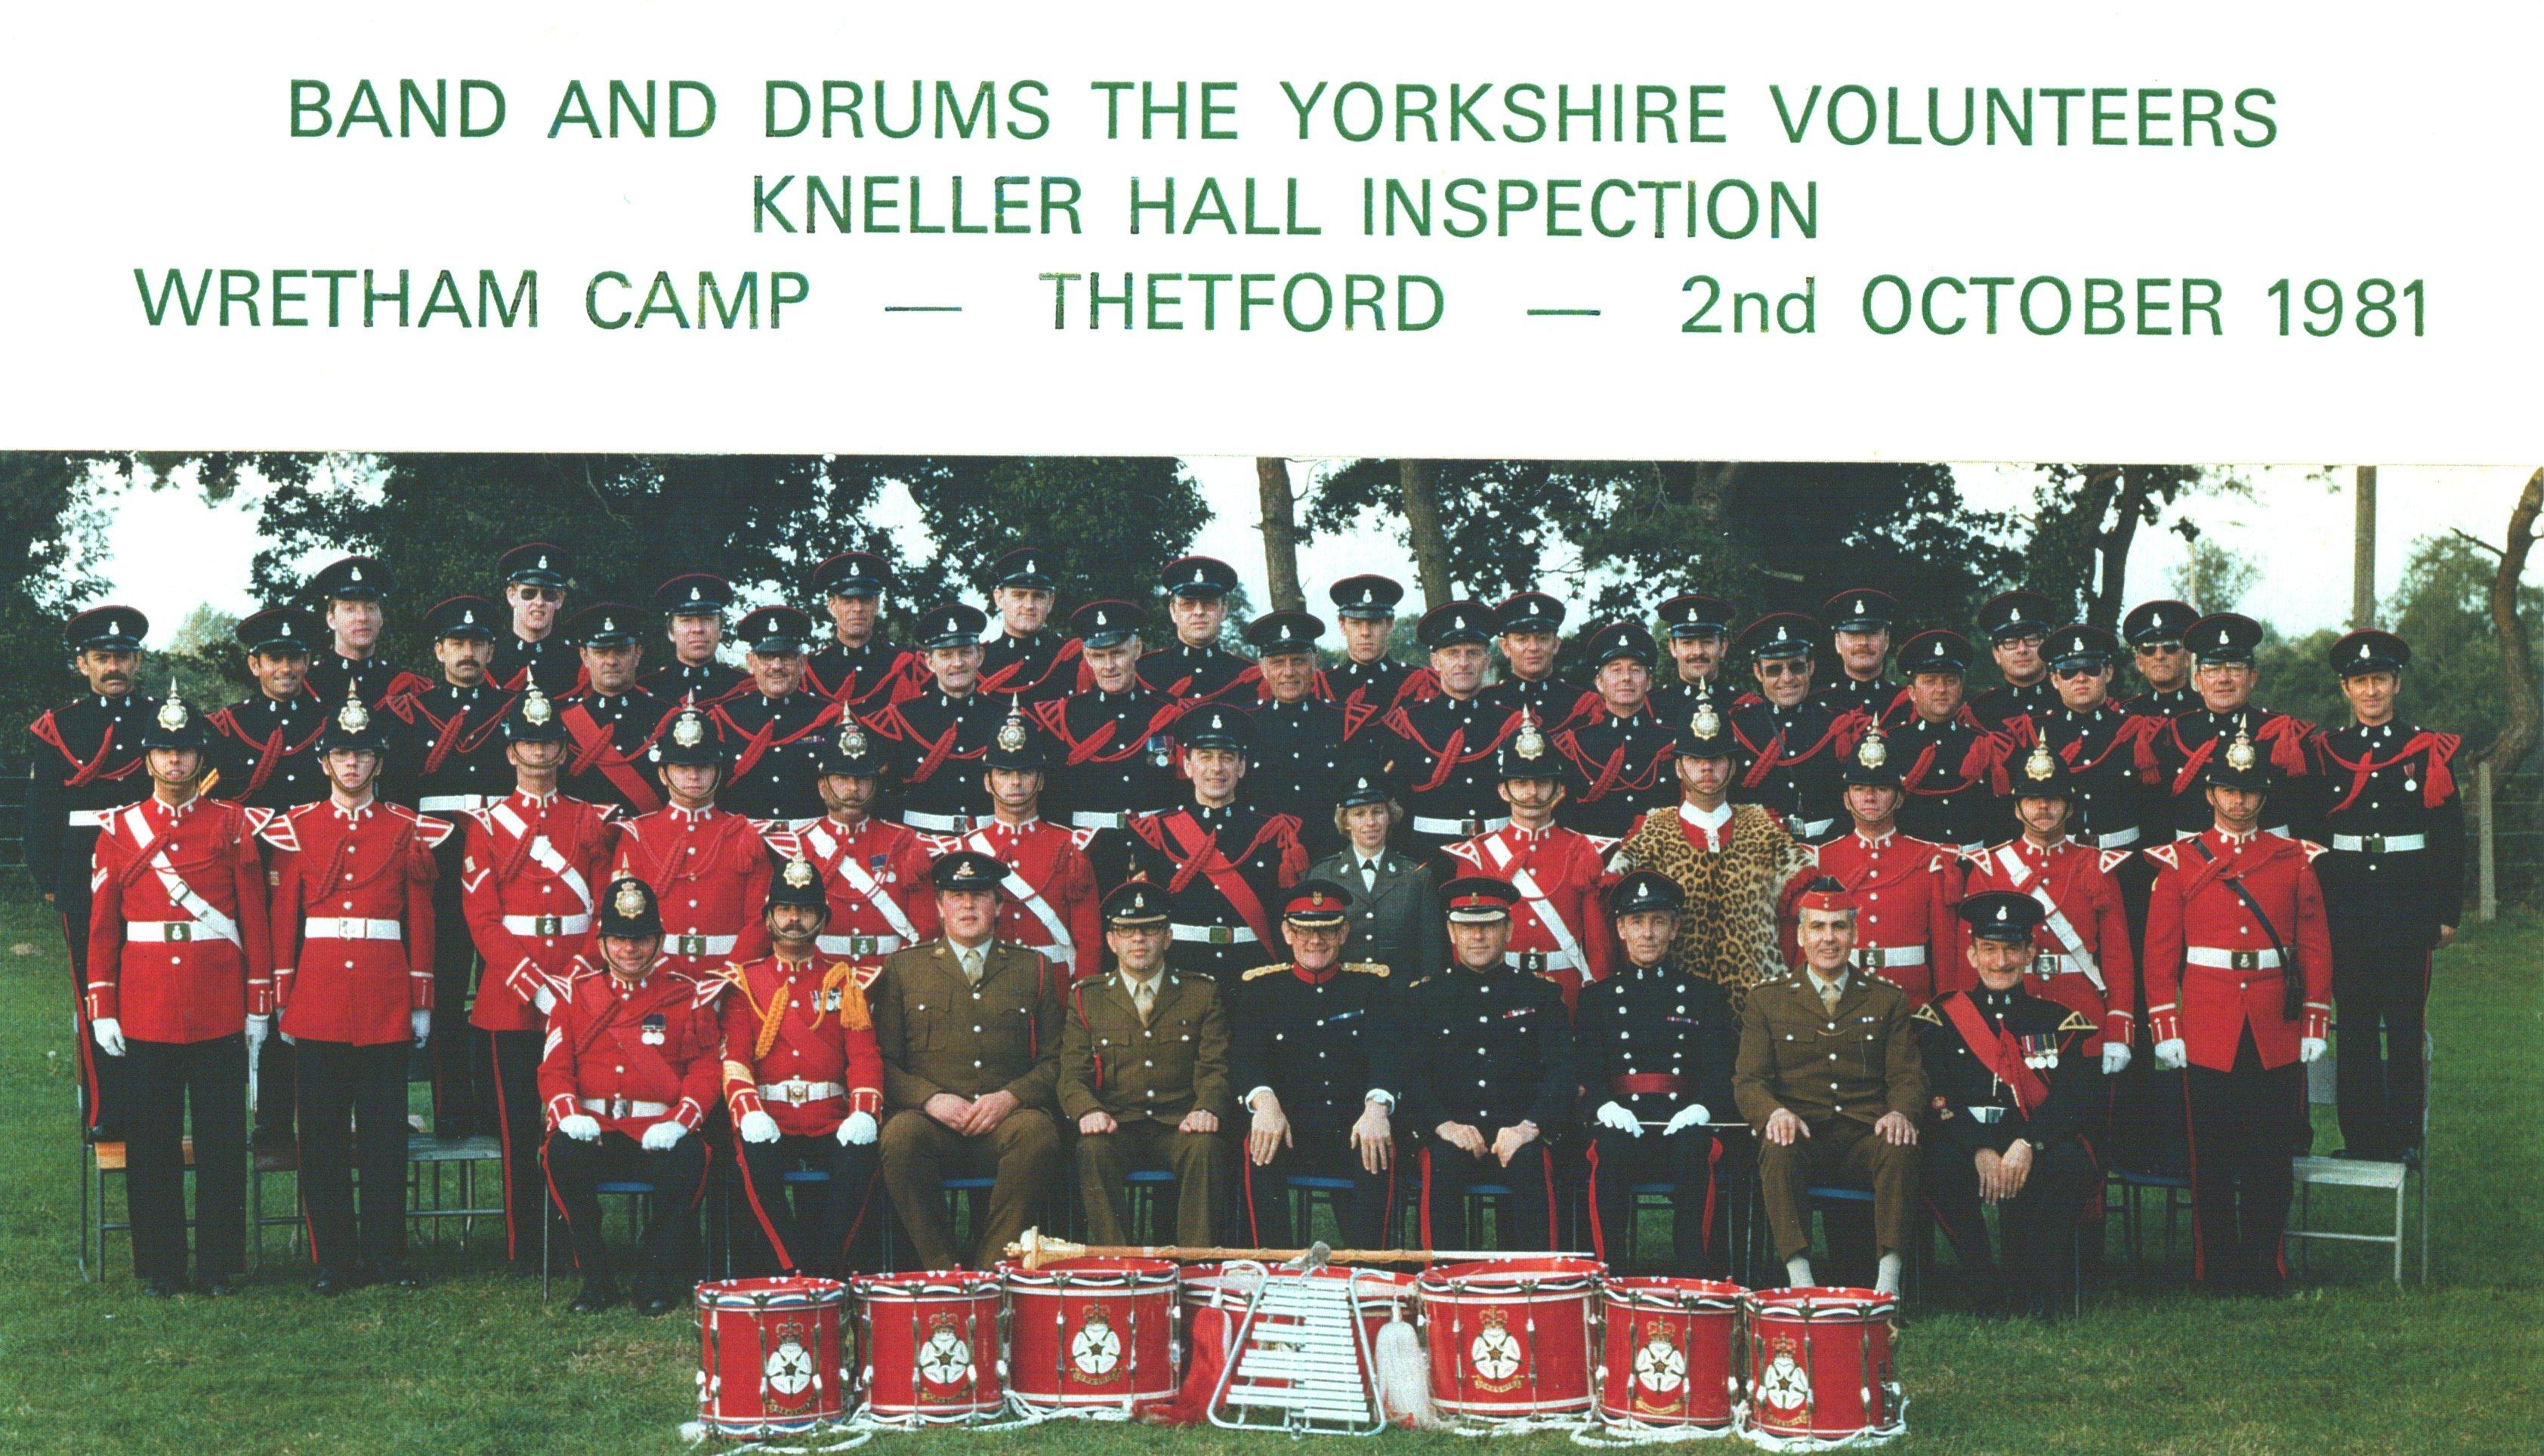 Yorks Vols 1981.JPG